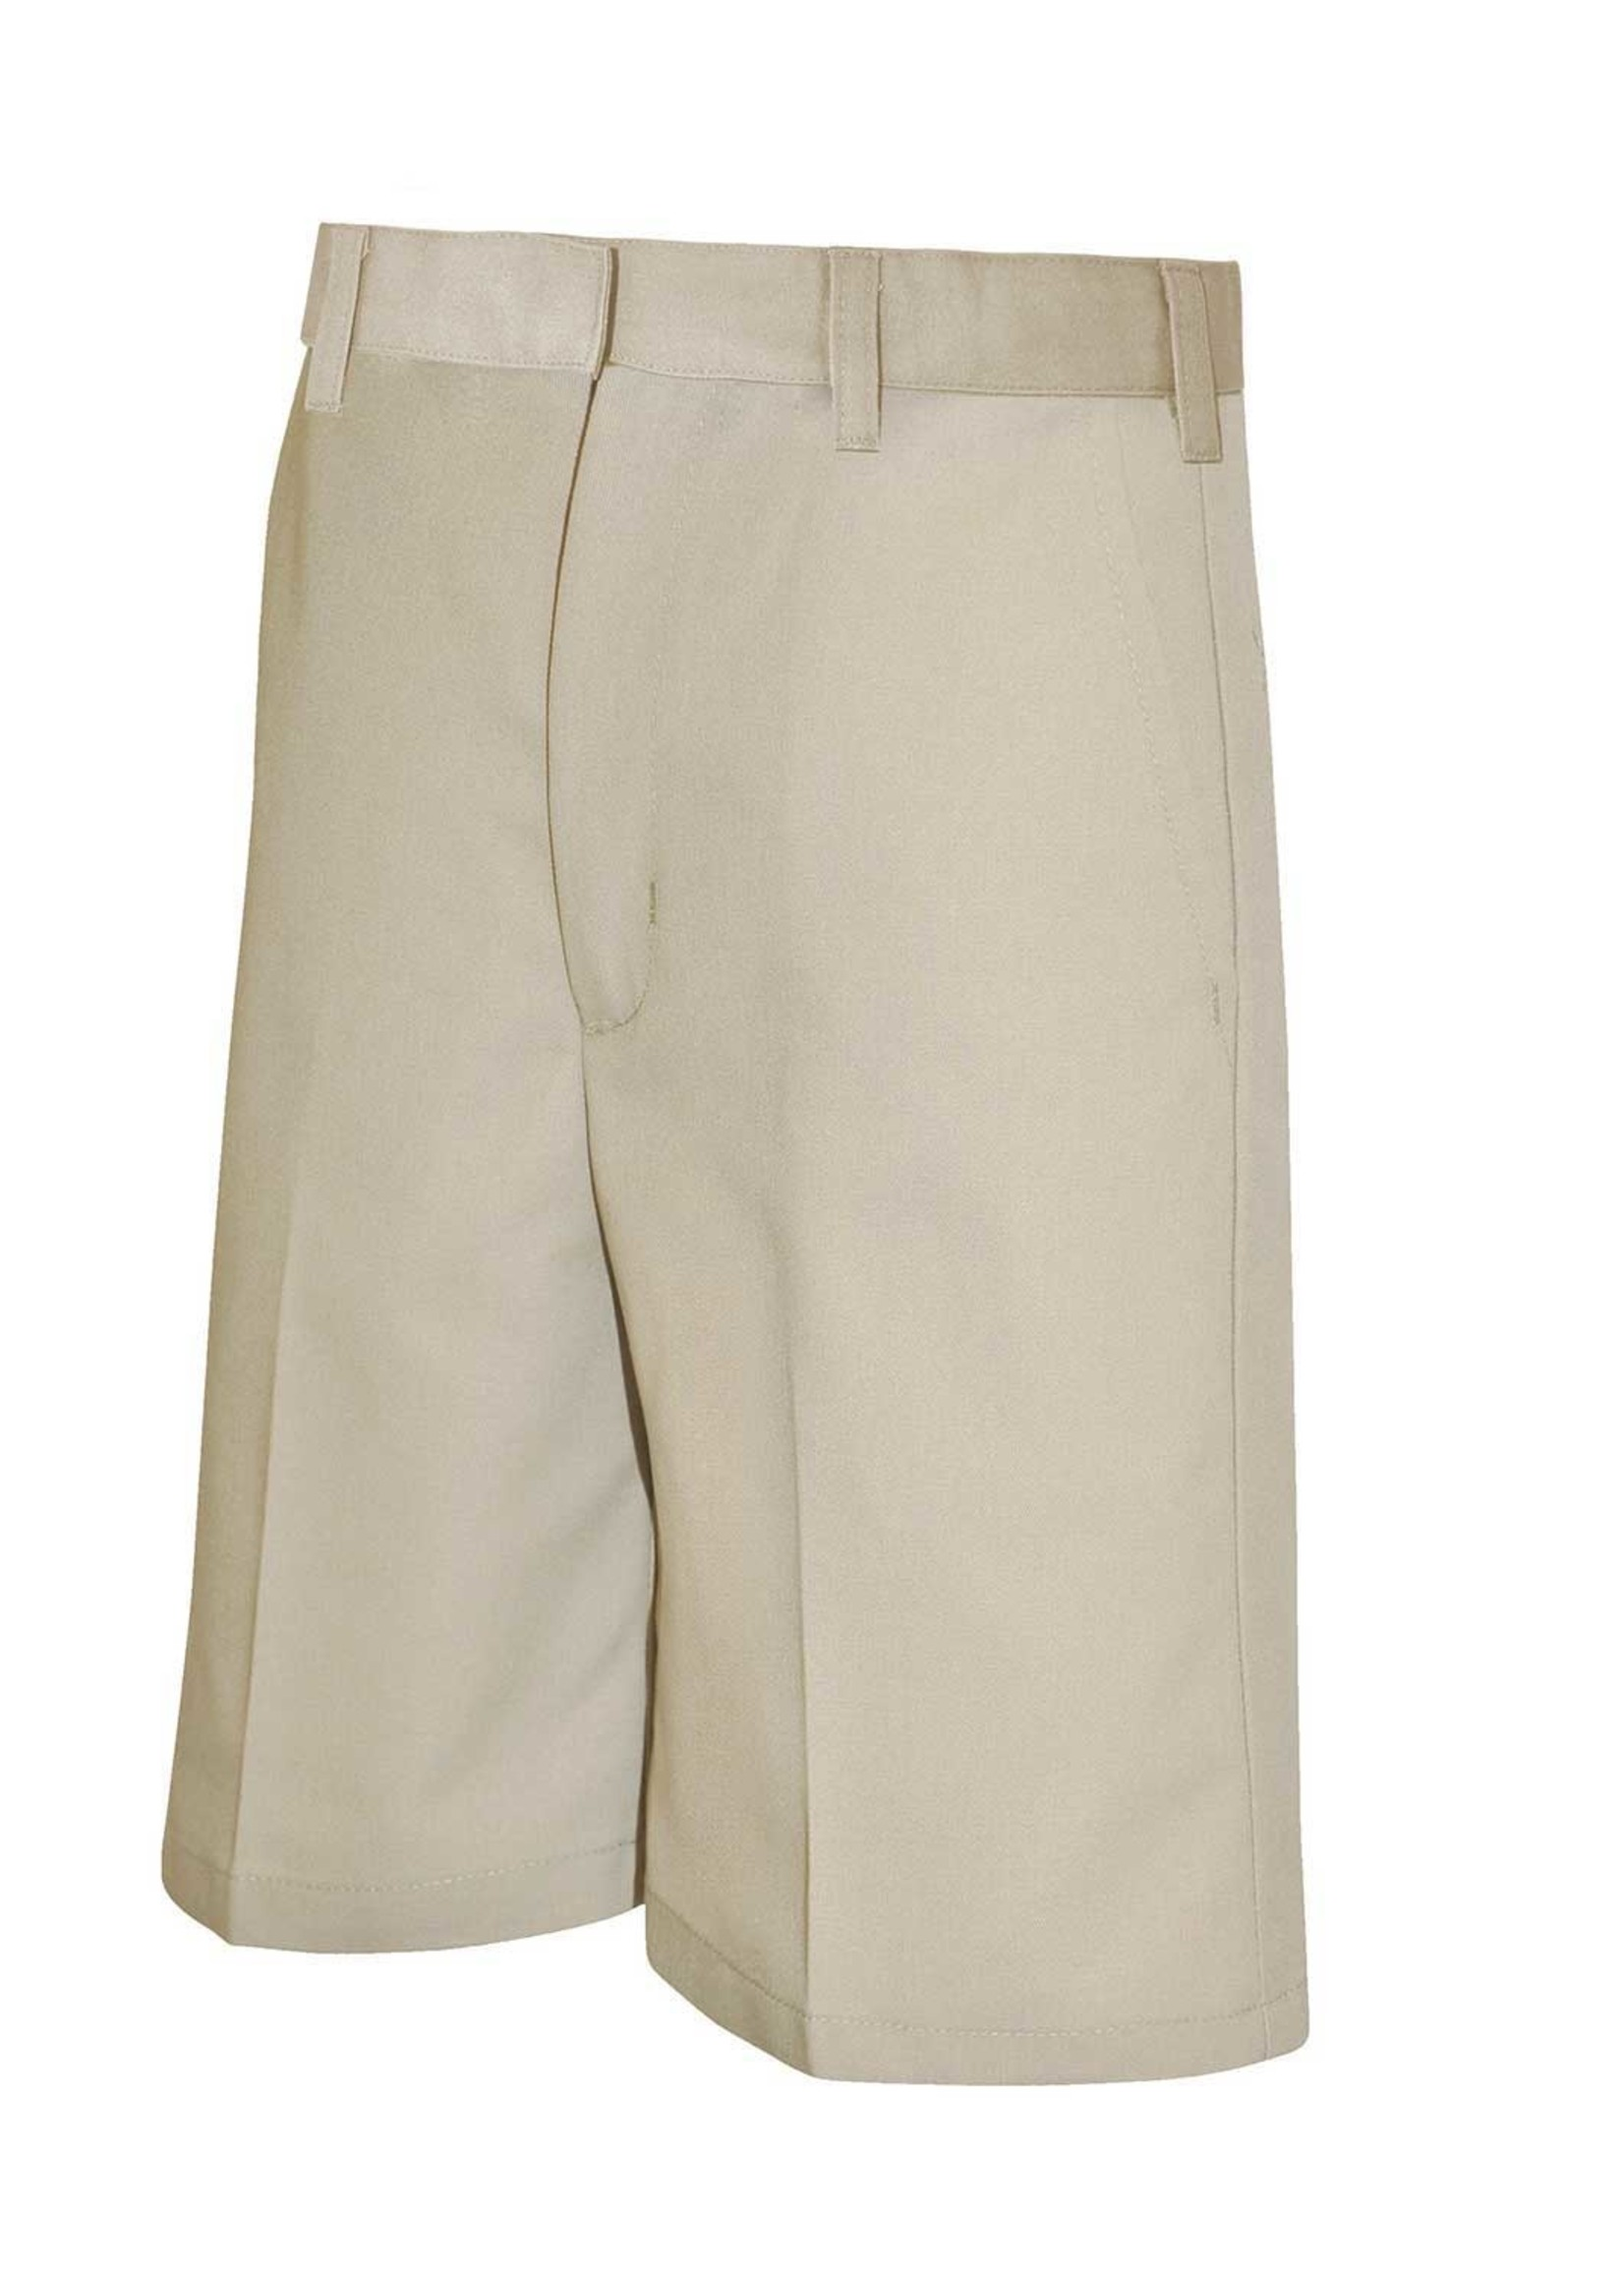 A+ Boys Flat Front Shorts (KN)